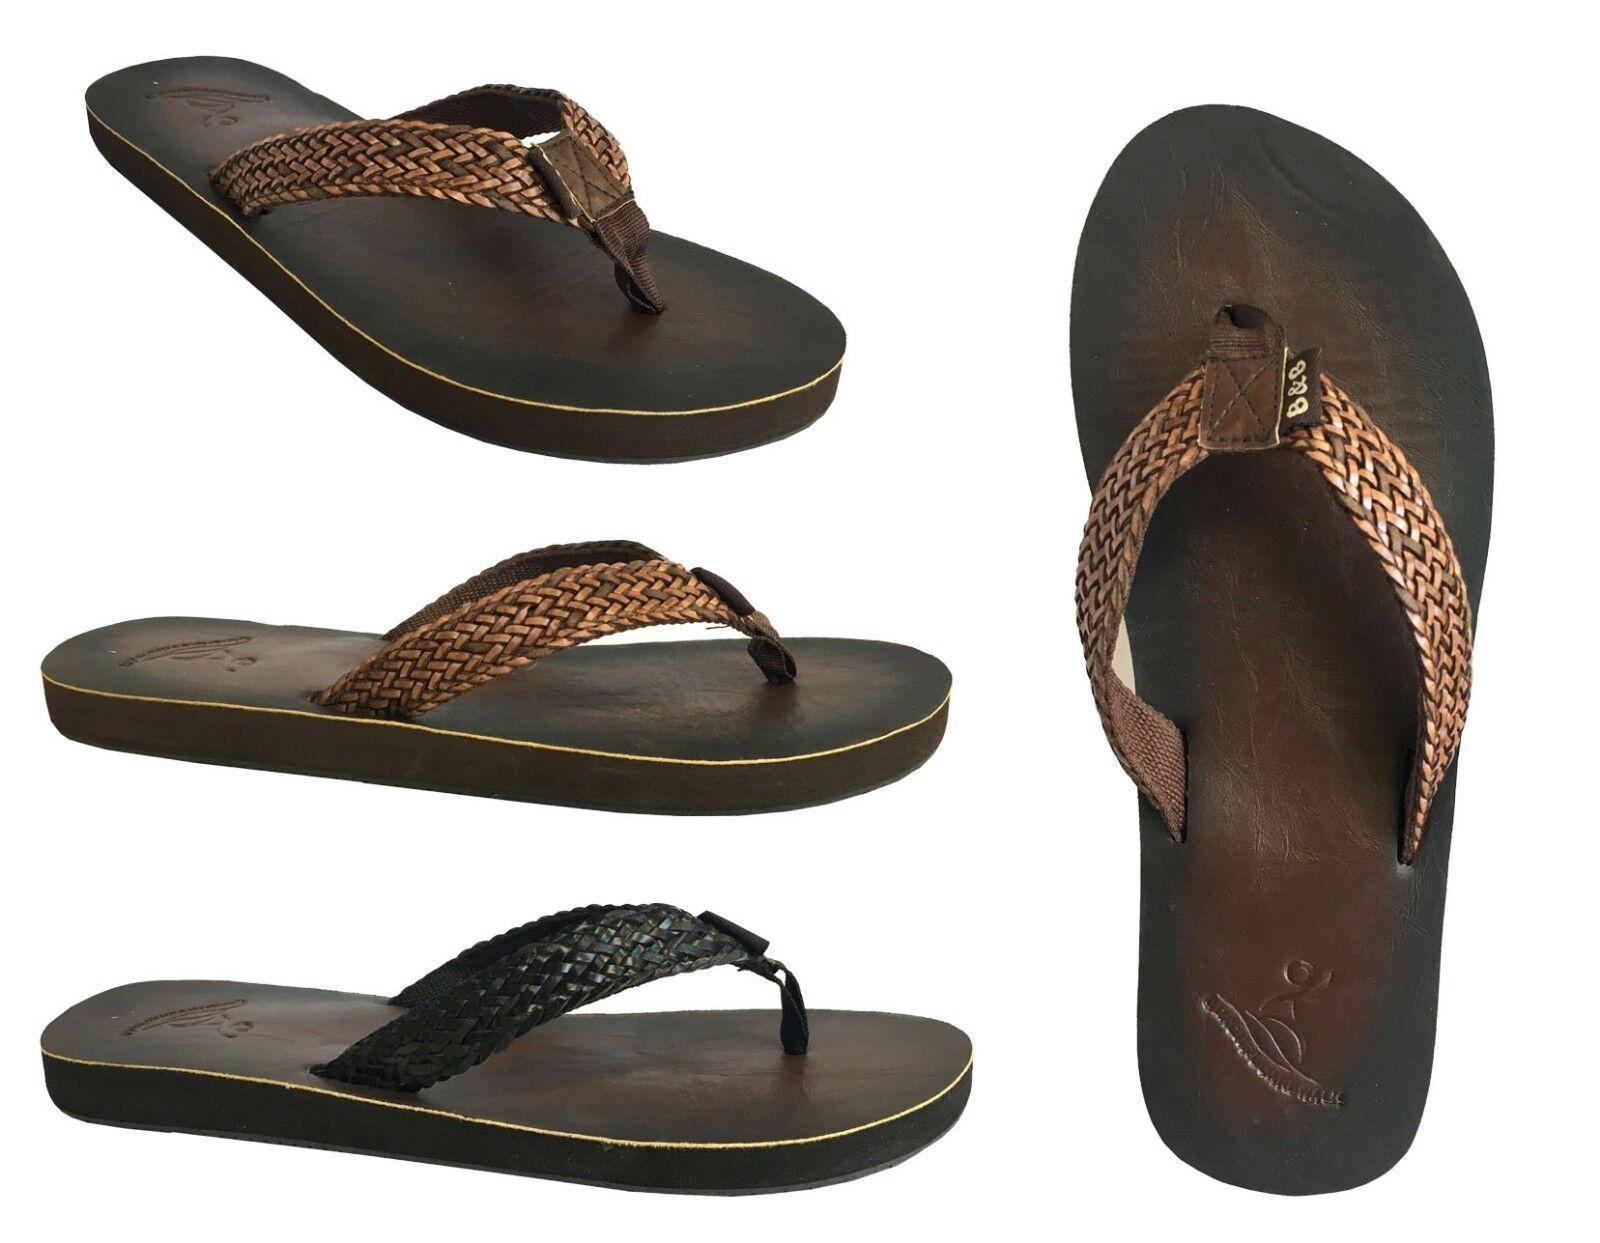 New  Distressed Women's Classic Braided Sandals Distressed  PU Beach Flip Flops SoCal--*619* 117e39